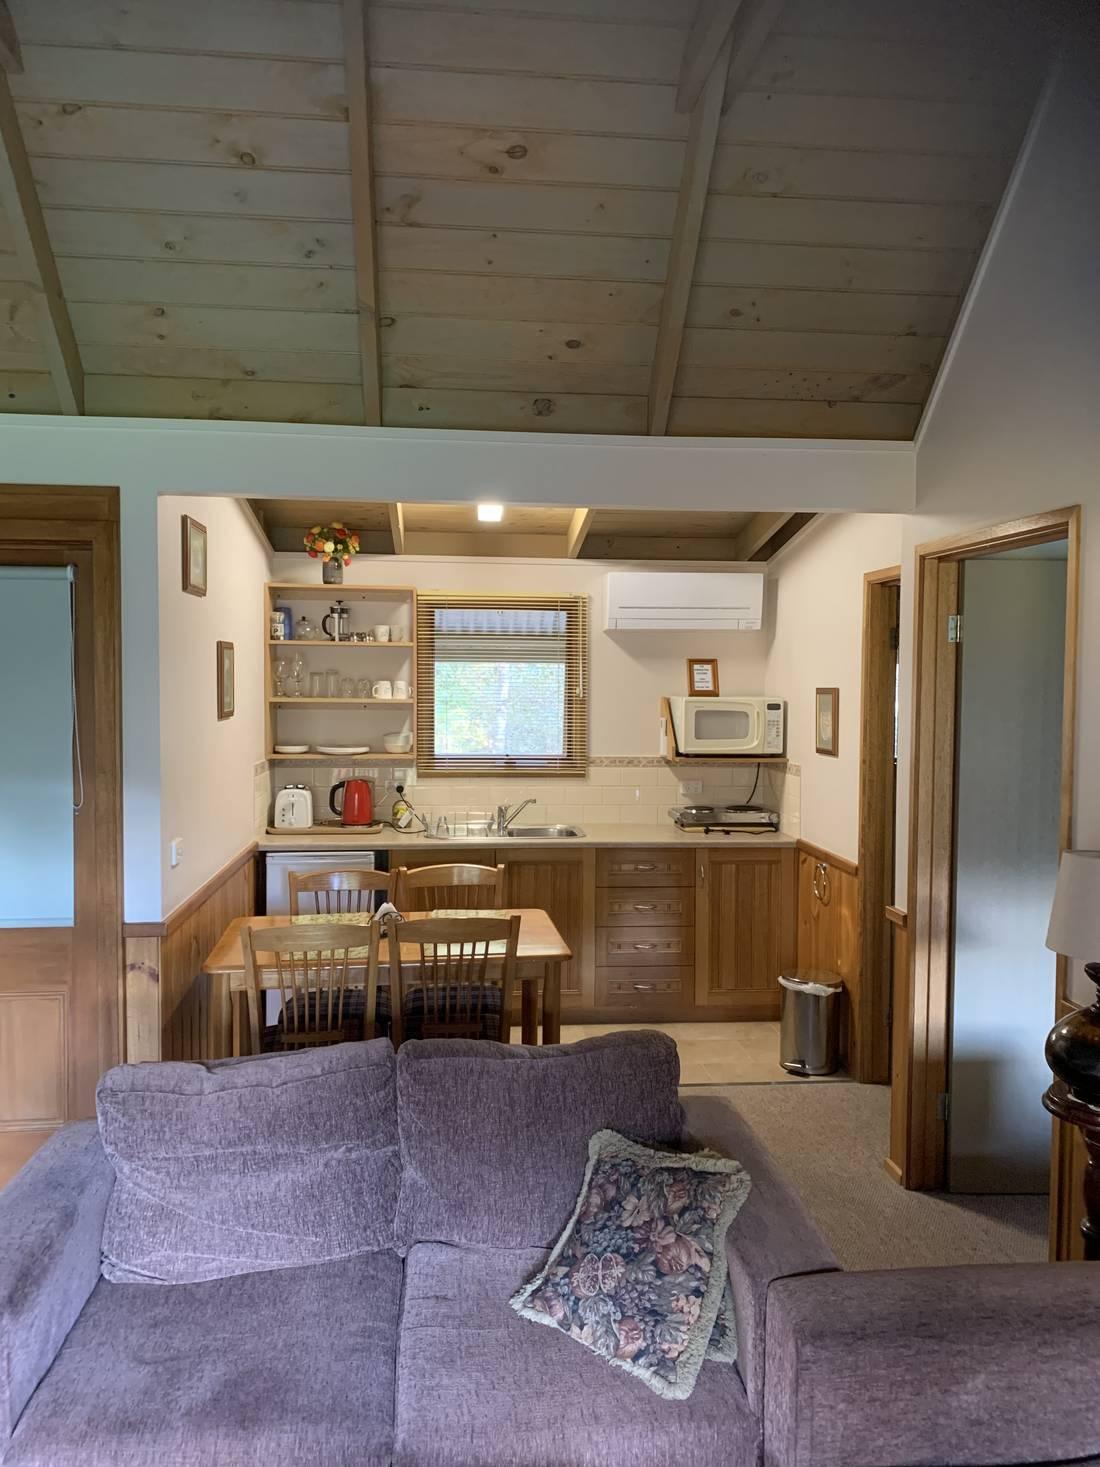 Shadybrook Harrievile apartment